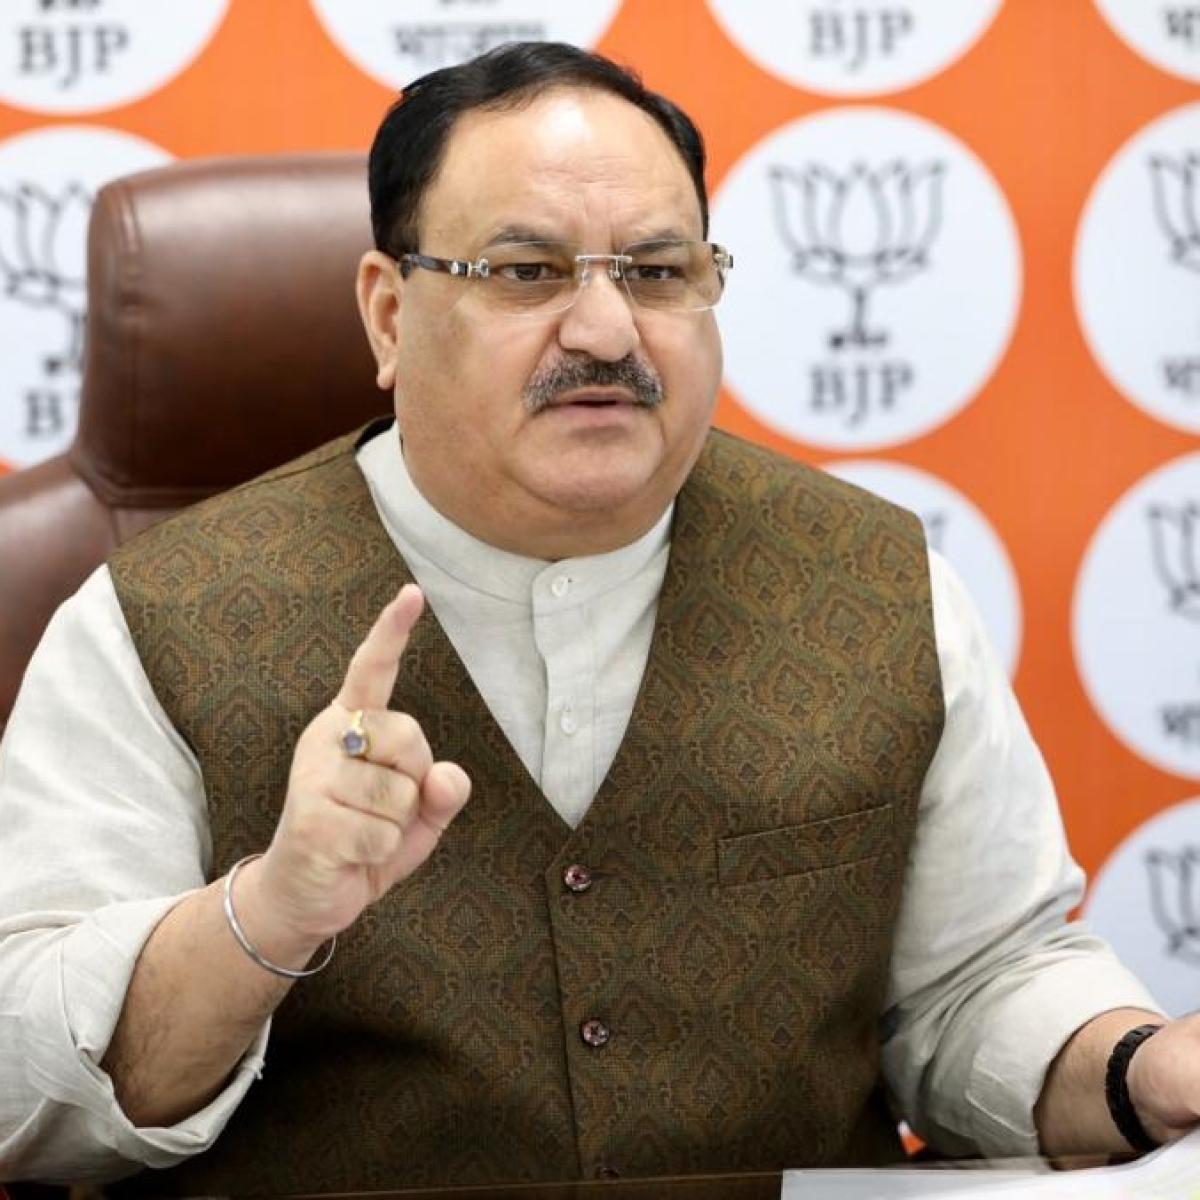 BJP Prez JP Nadda meets Rajasthan leaders; Vasundhara Raje's absence fuels speculation